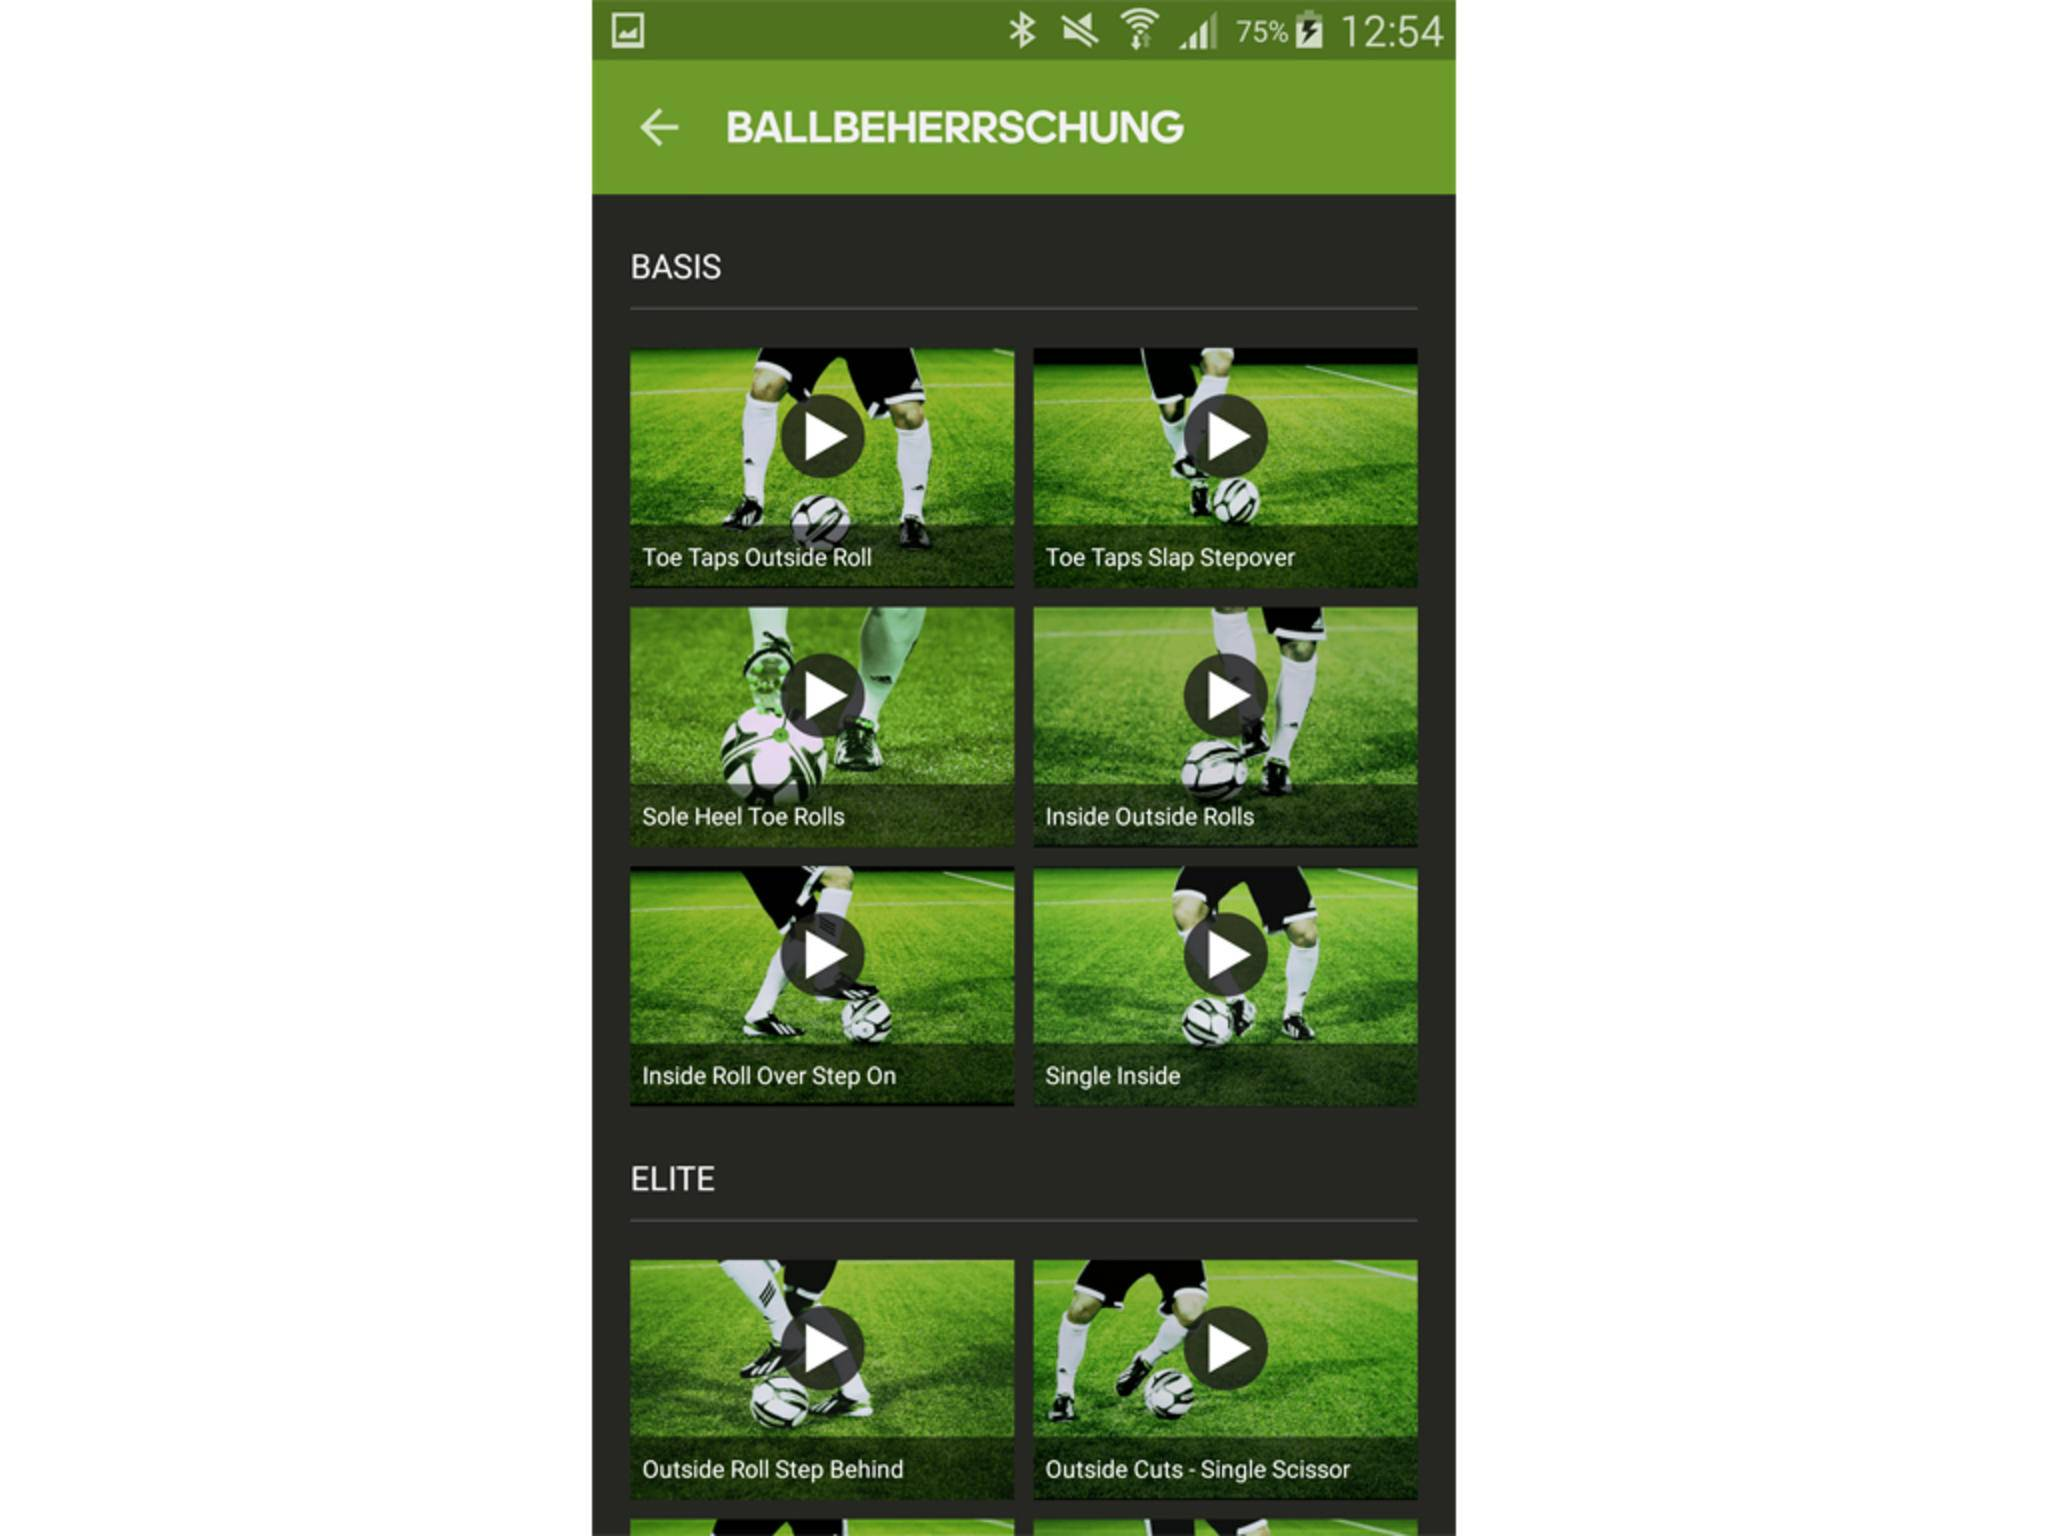 Adidas miCoach Smart Ball App 12